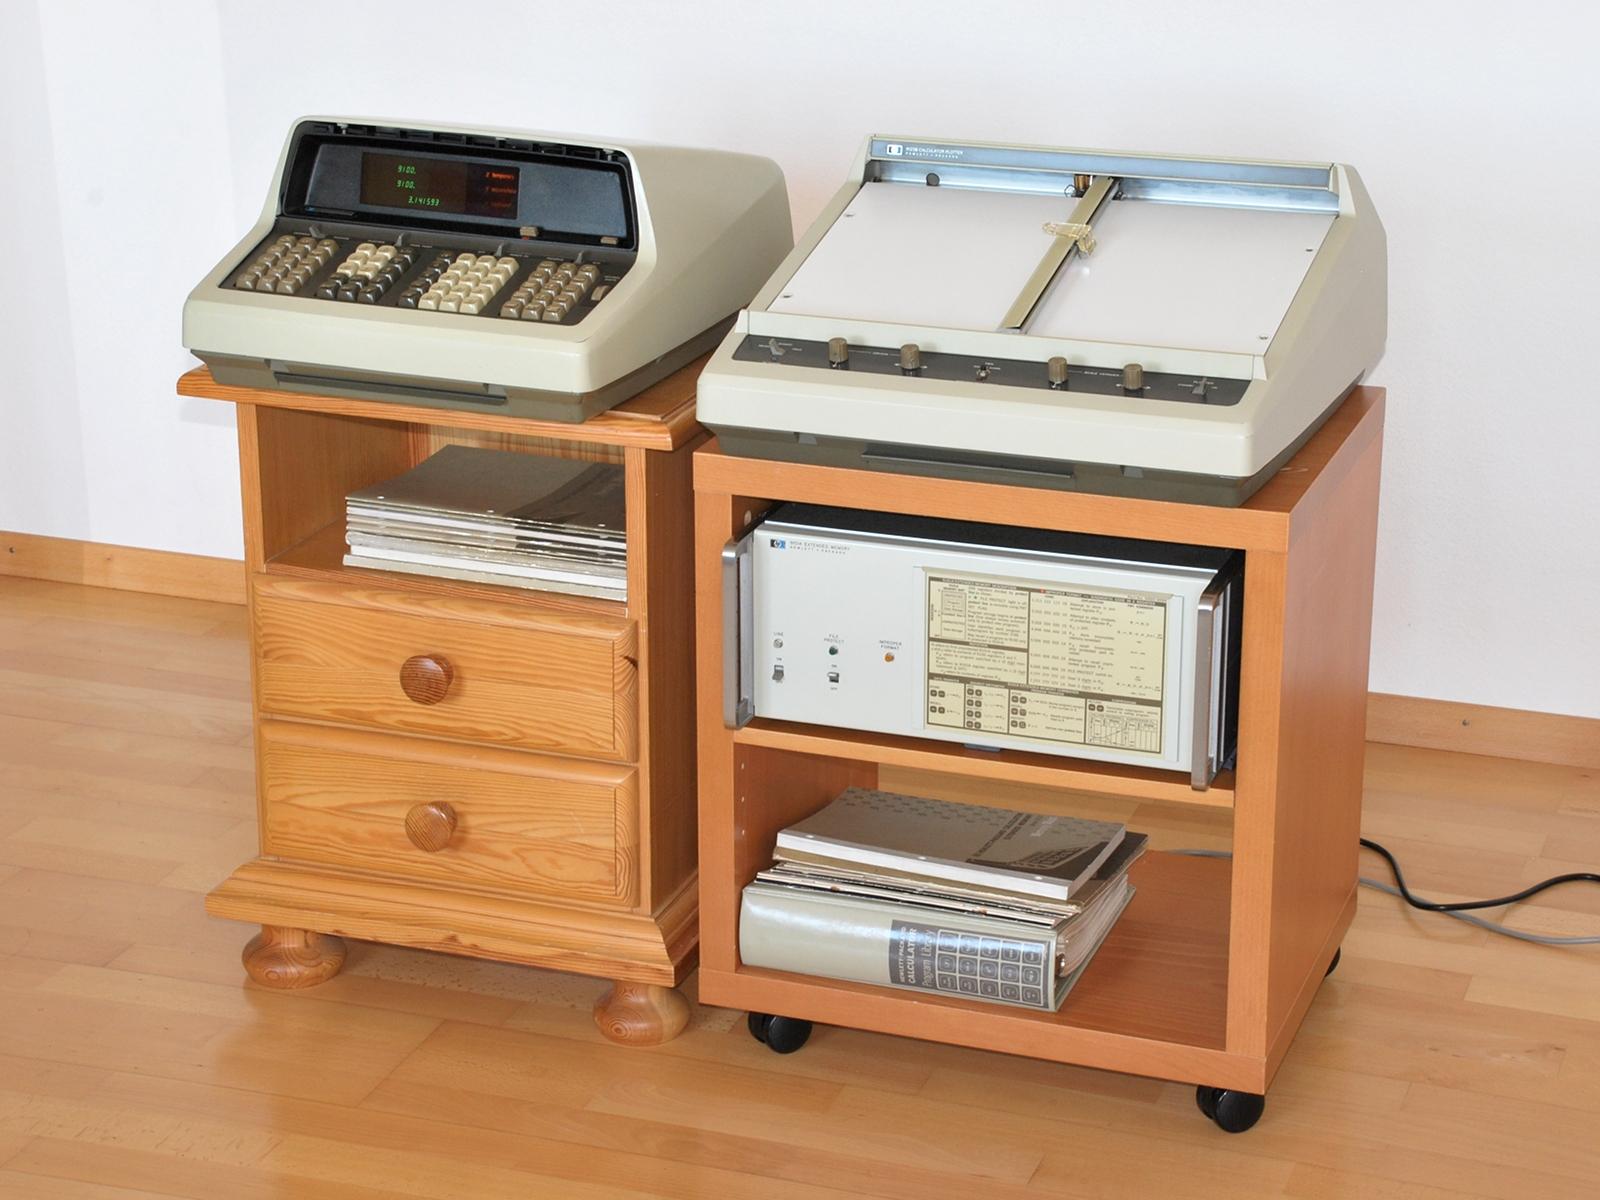 HP 9100B System